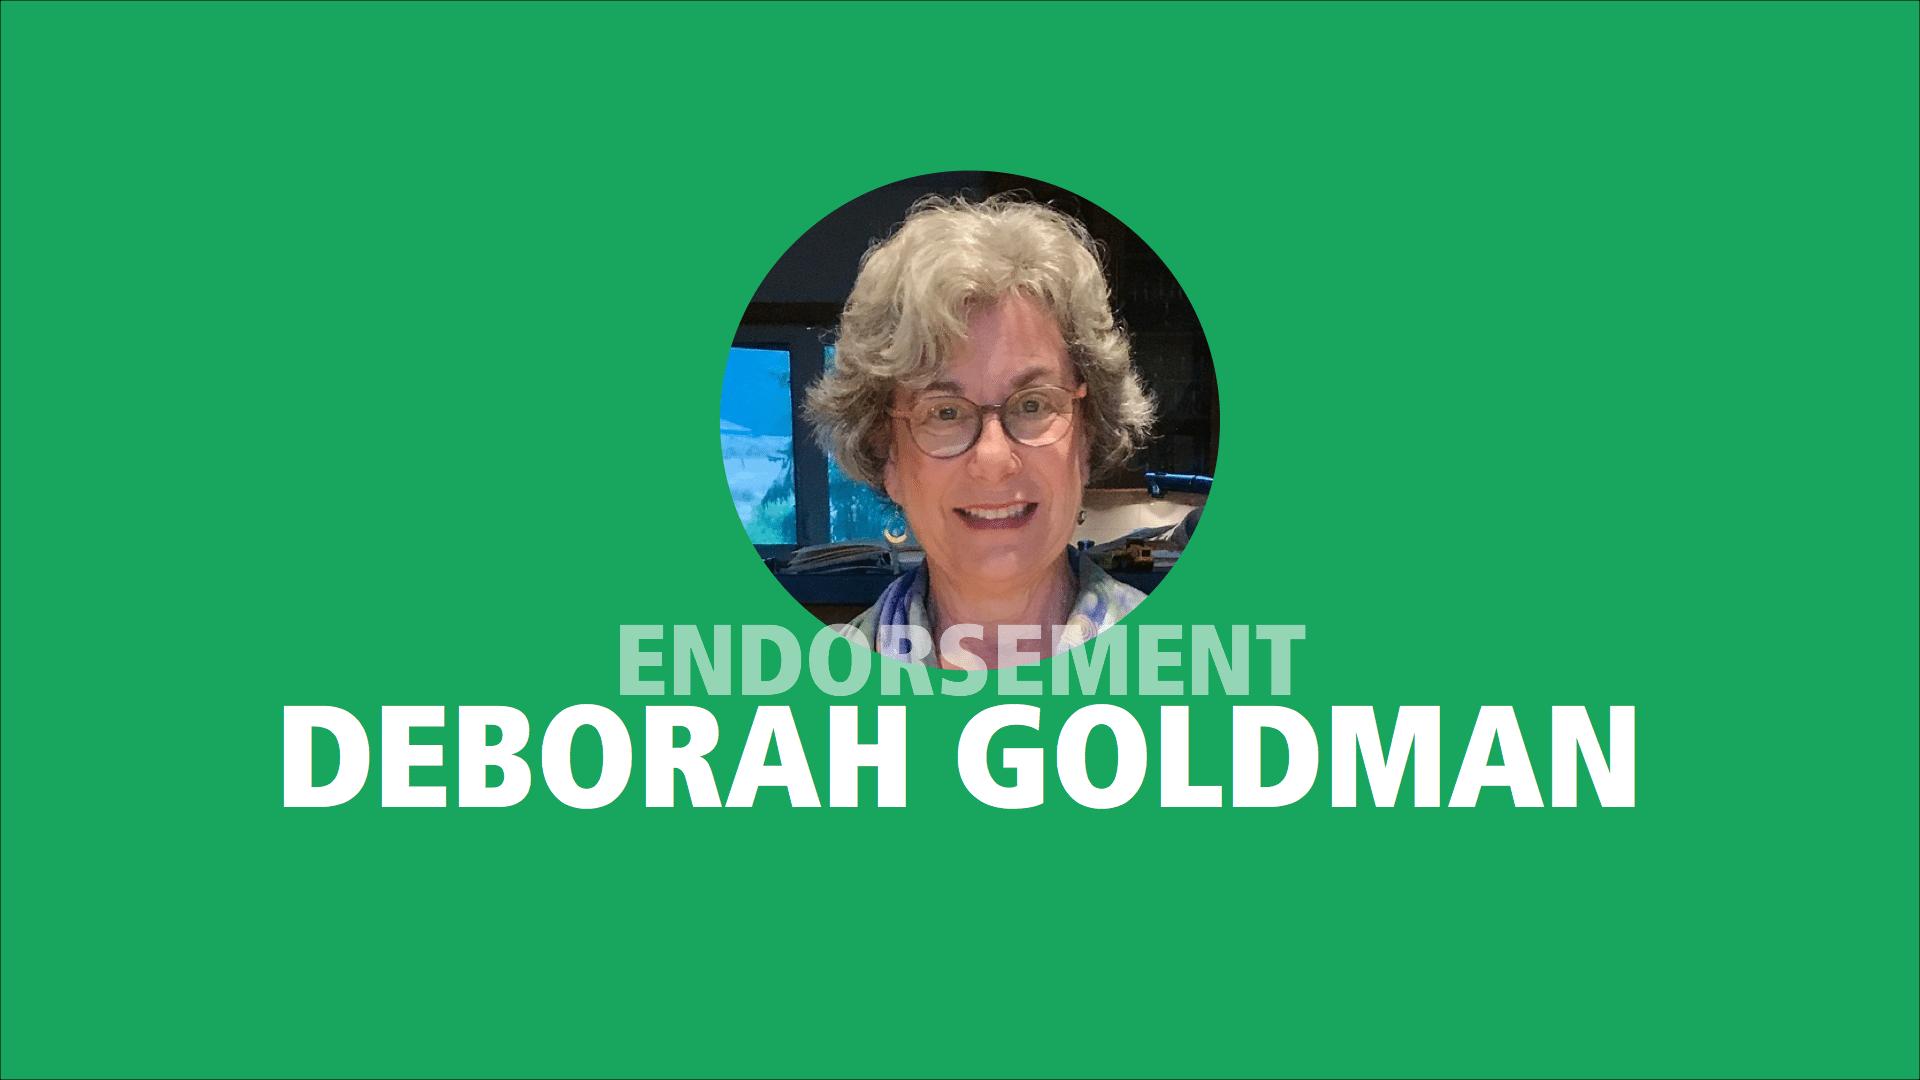 Deborah Goldman endorses Adam Olsen